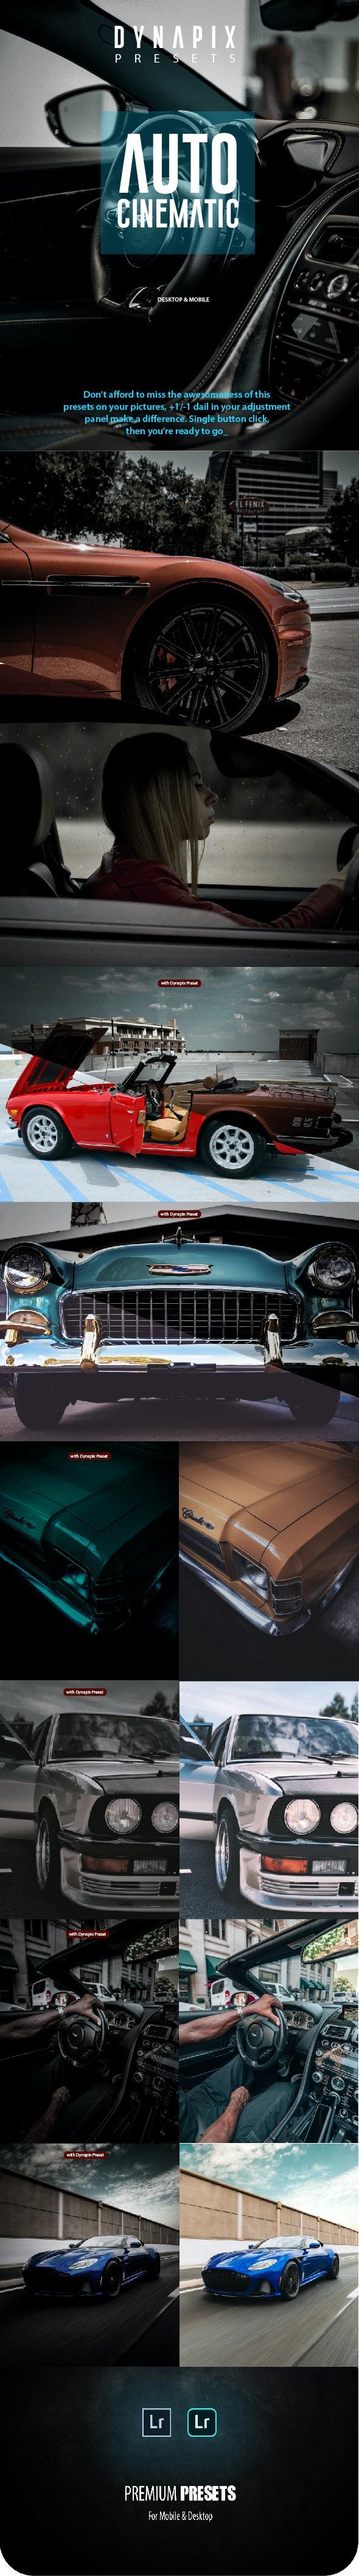 DYNAPIX Auto Cinematic Lightroom Mobile and Desktop Presets - Lightroom Presets Add-ons